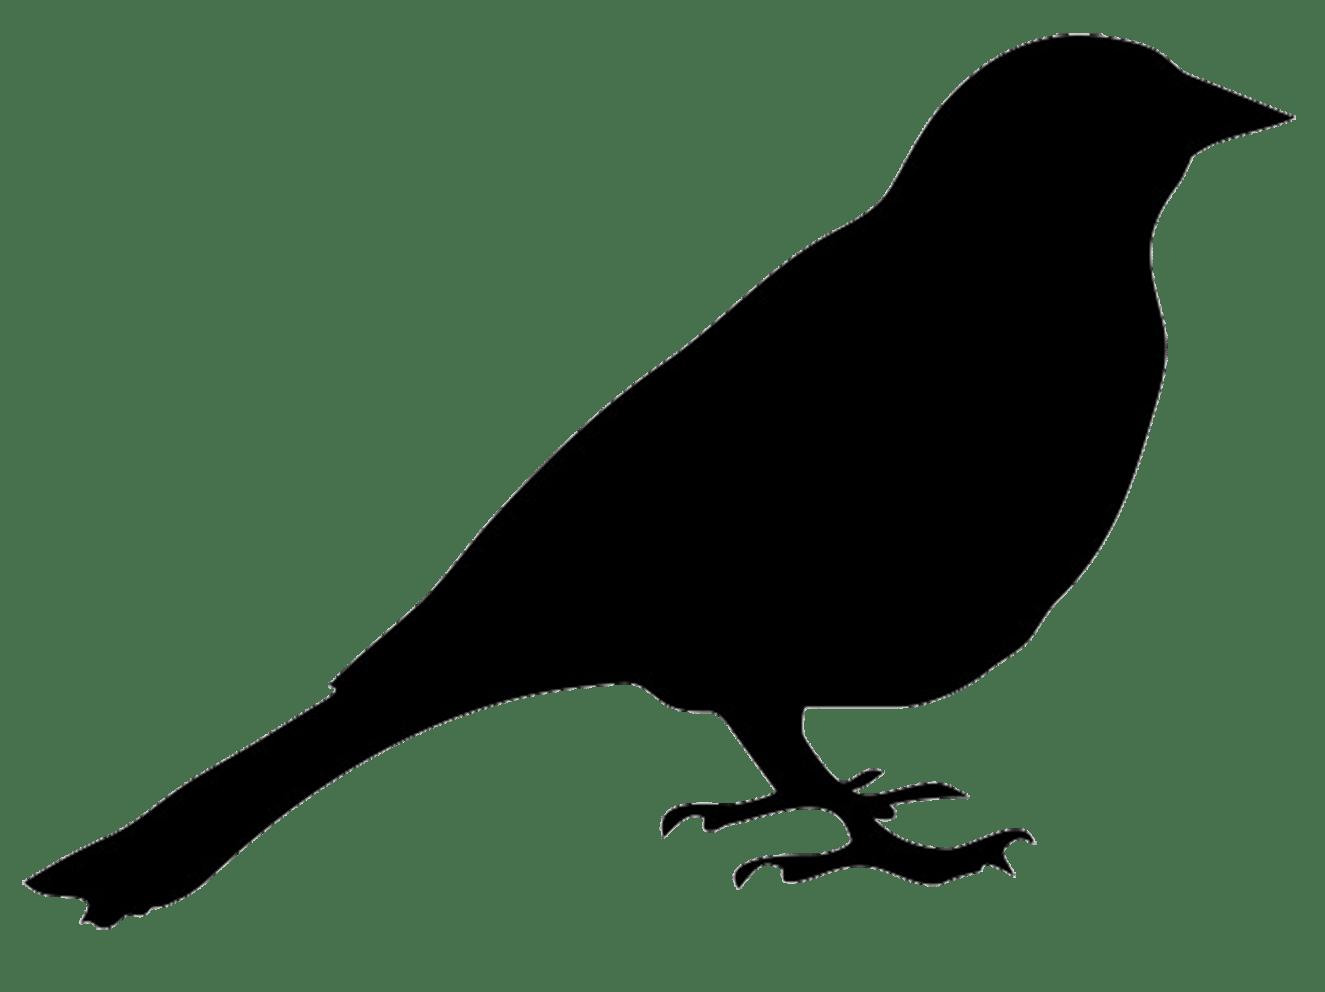 Bird Silhouette Drawing Clip art.